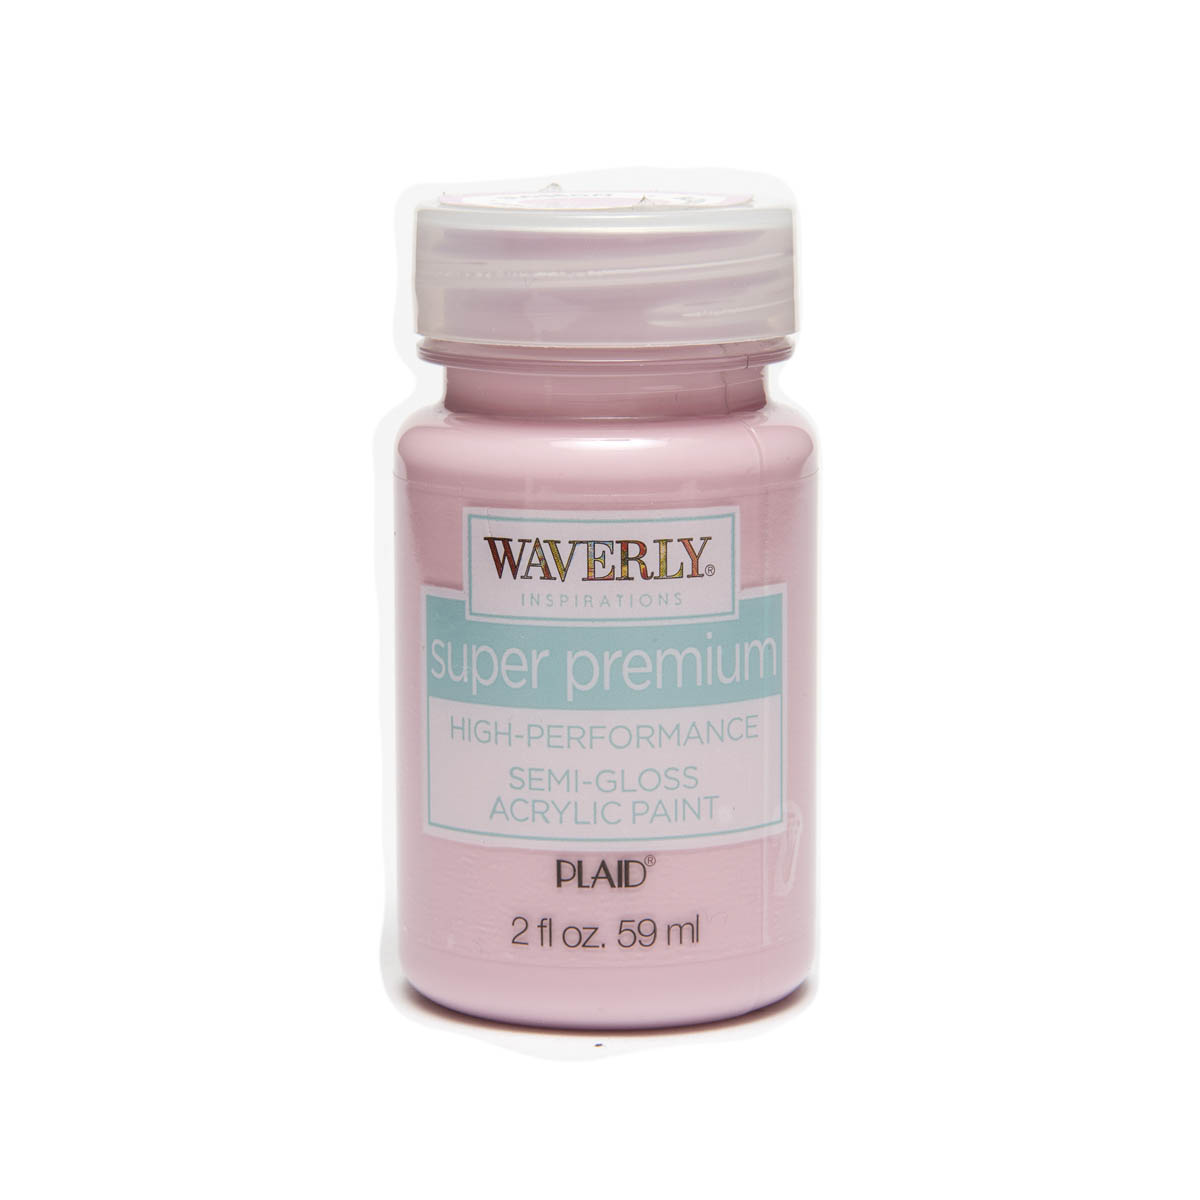 Waverly ® Inspirations Super Premium Semi-Gloss Acrylic Paint - Blossom, 2 oz.